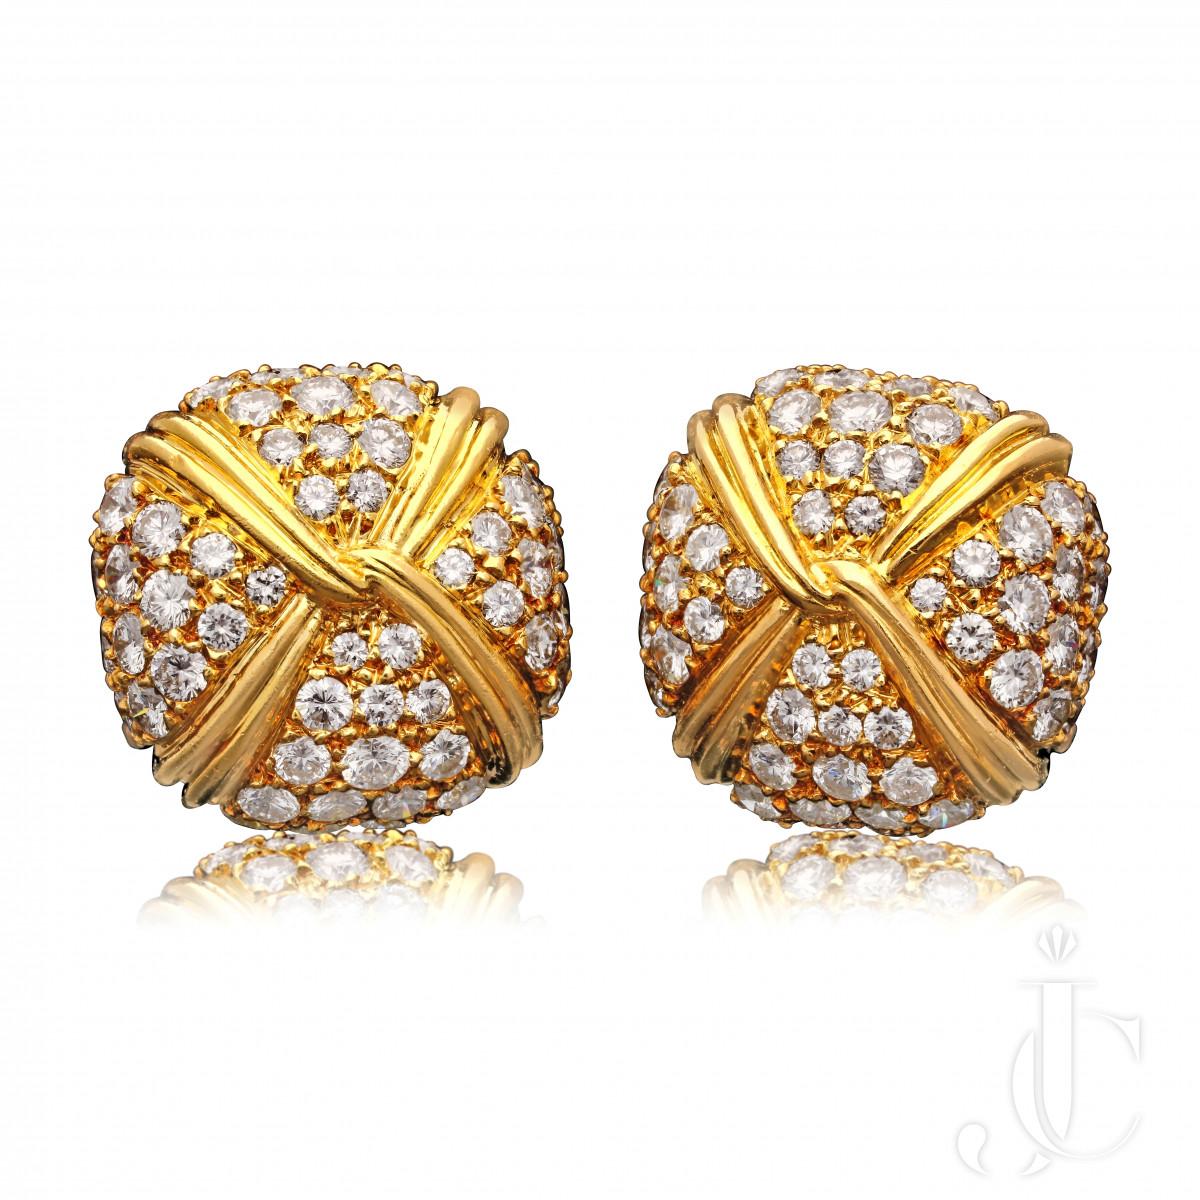 Georges Lenfant Pave set diamond 18ct gold earrings